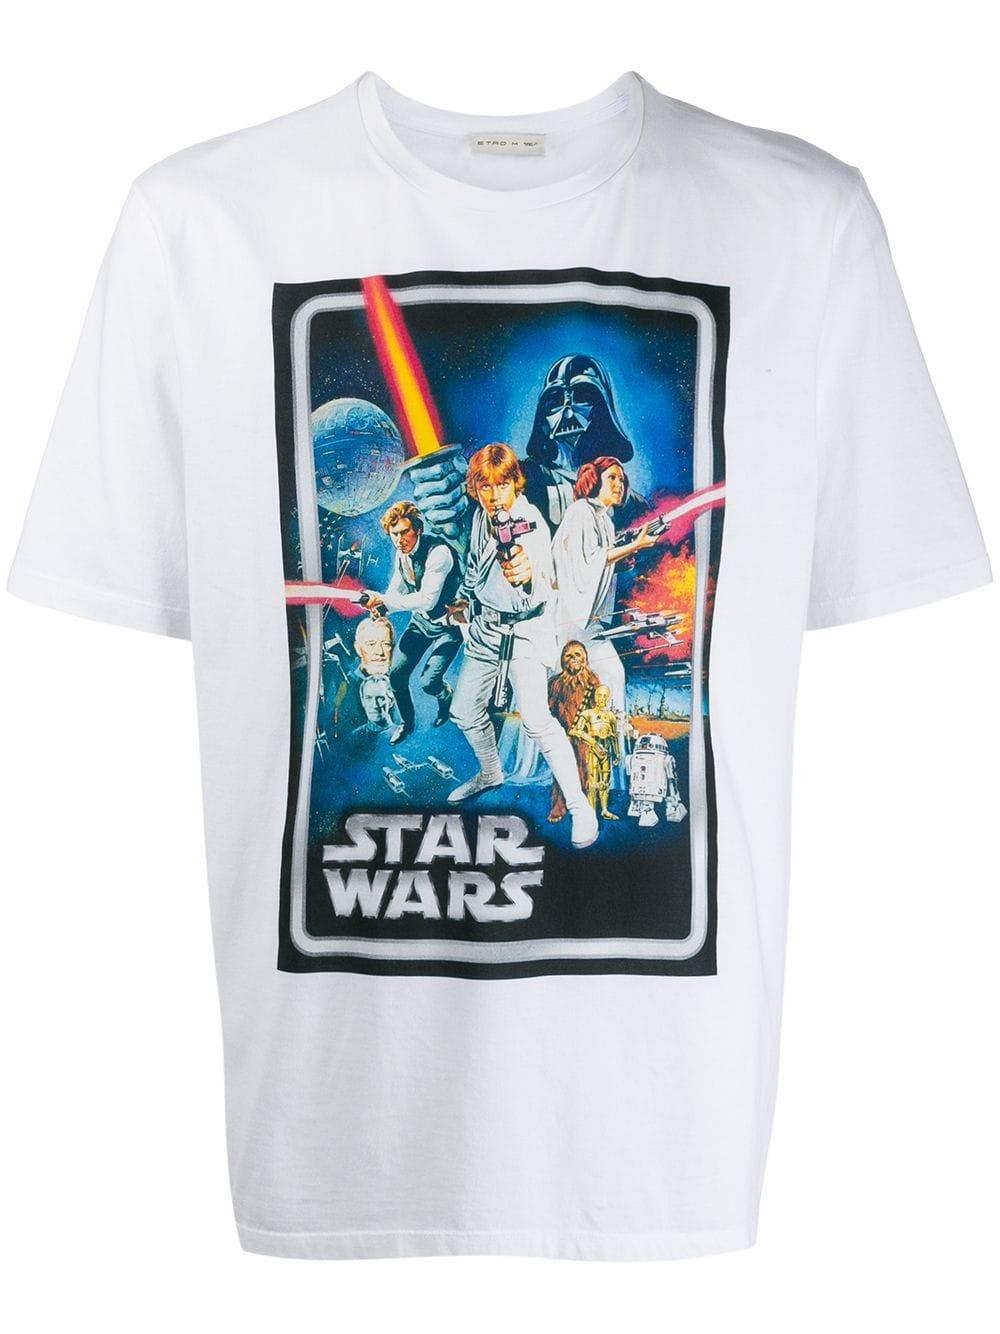 Etro x Star Wars Printed T-Shirt